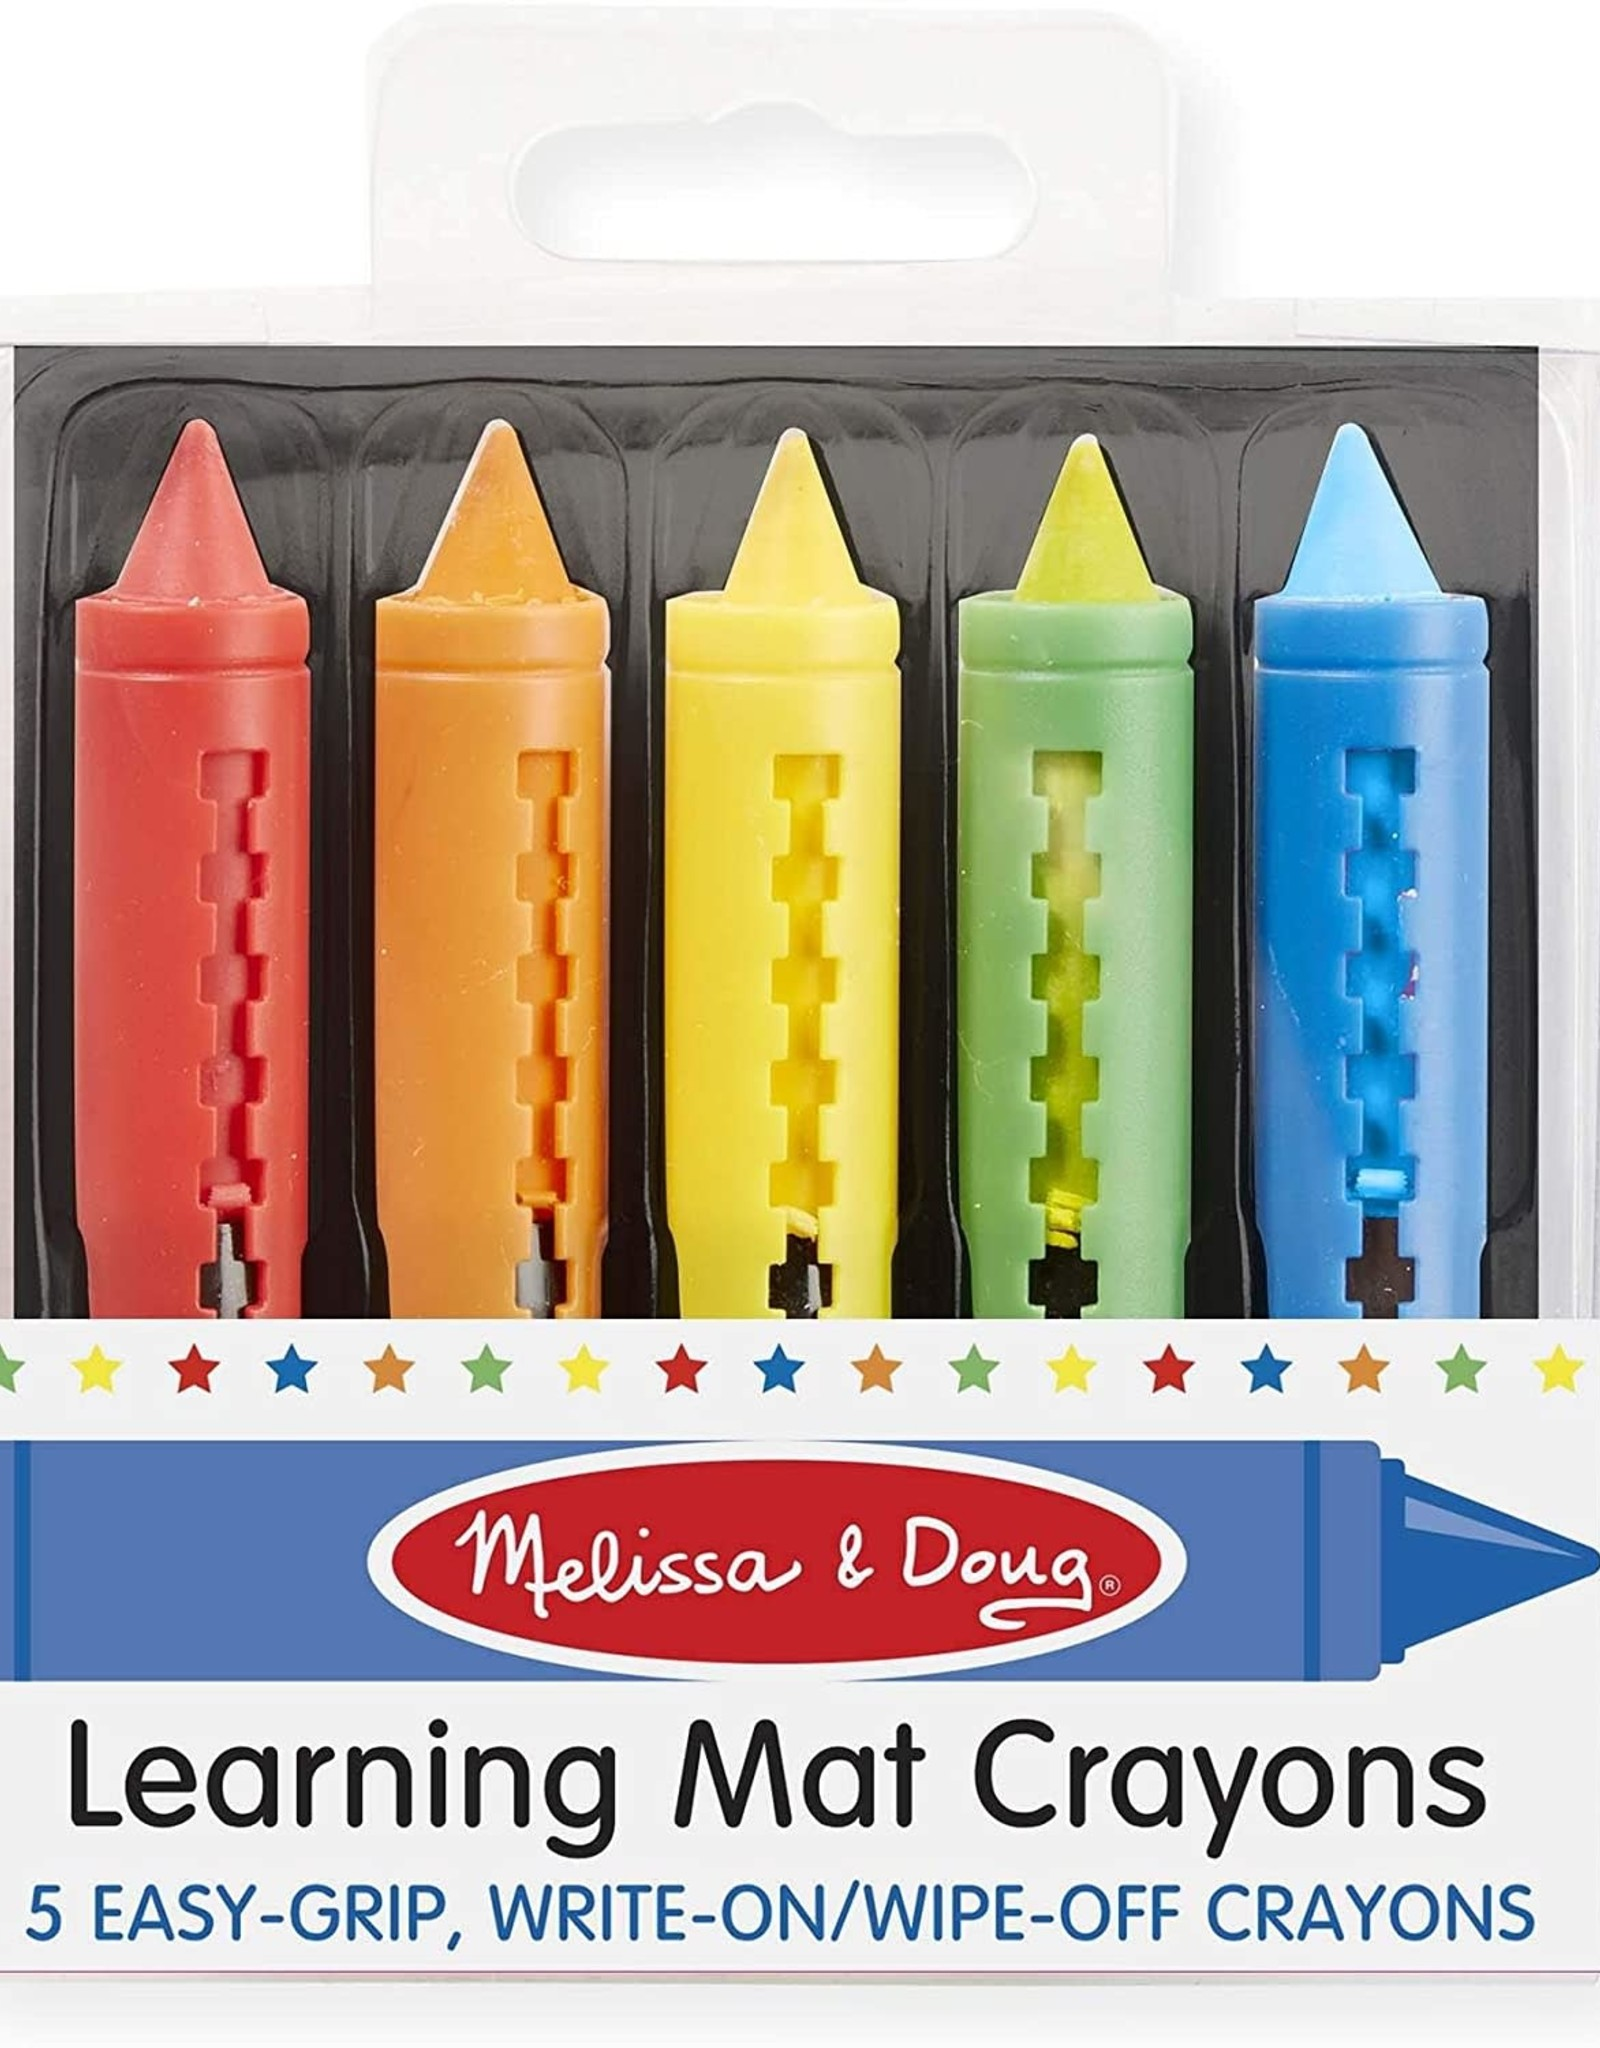 Melissa & Doug Melissa & Doug Learning Mat Crayons